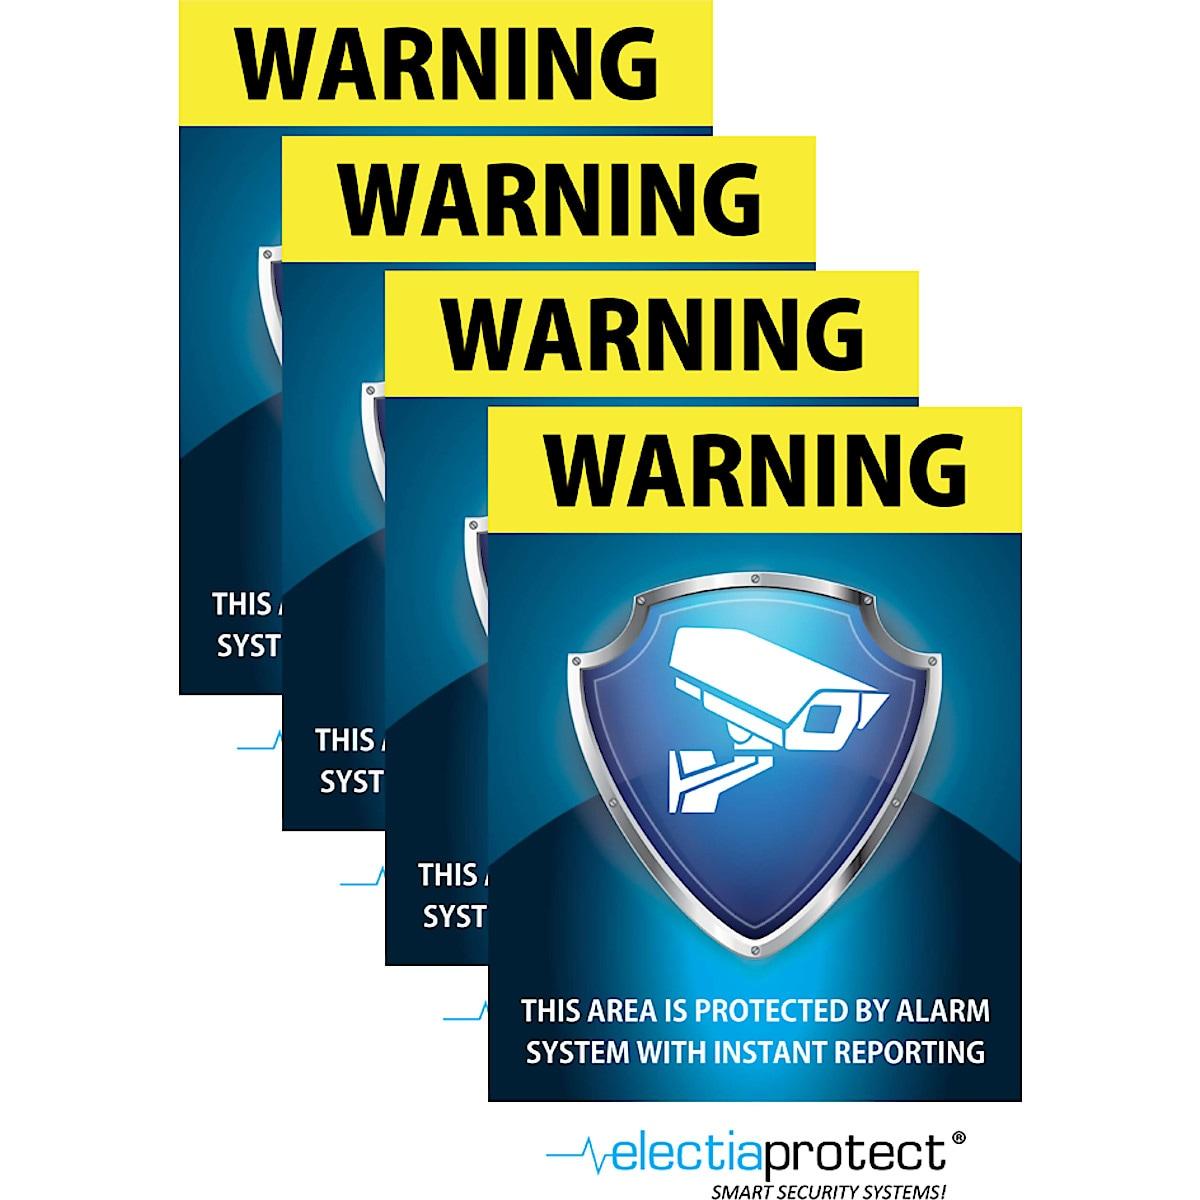 Hälytystarra Electia Protect 4 kpl